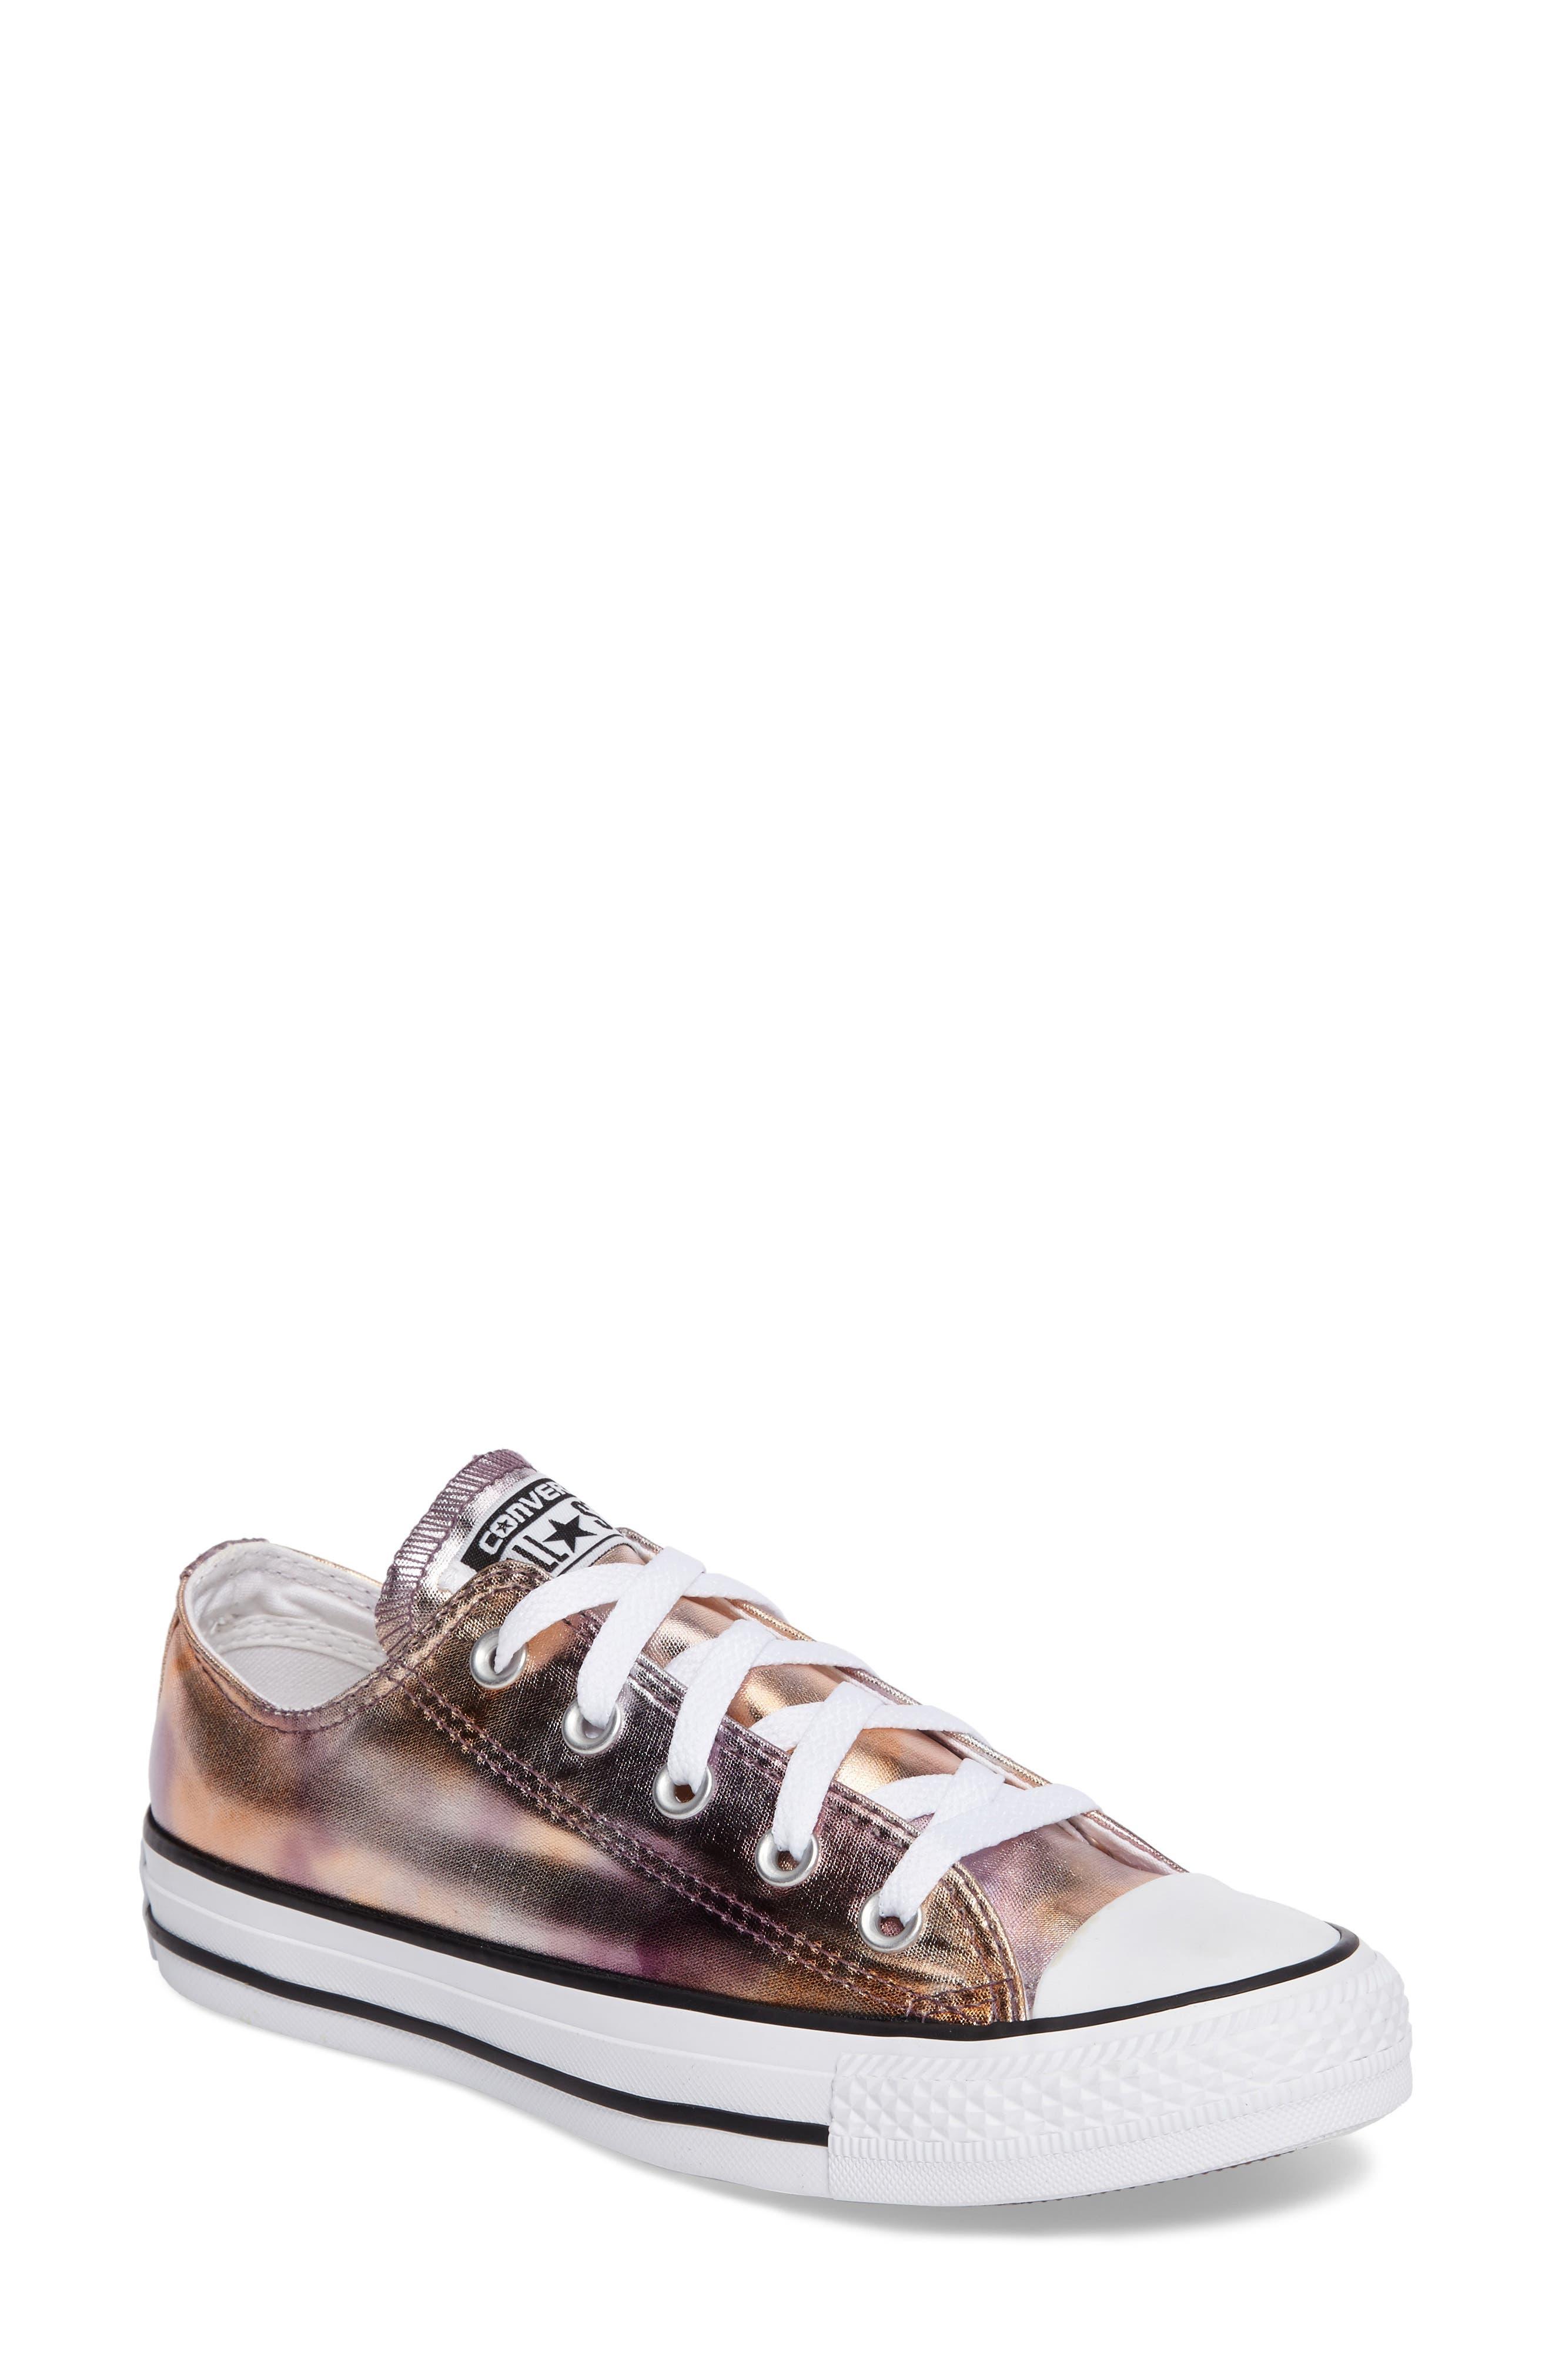 Chuck Taylor<sup>®</sup> All Star<sup>®</sup> Seasonal Metallic Ox Low Top Sneaker,                             Main thumbnail 1, color,                             Dusk Pink